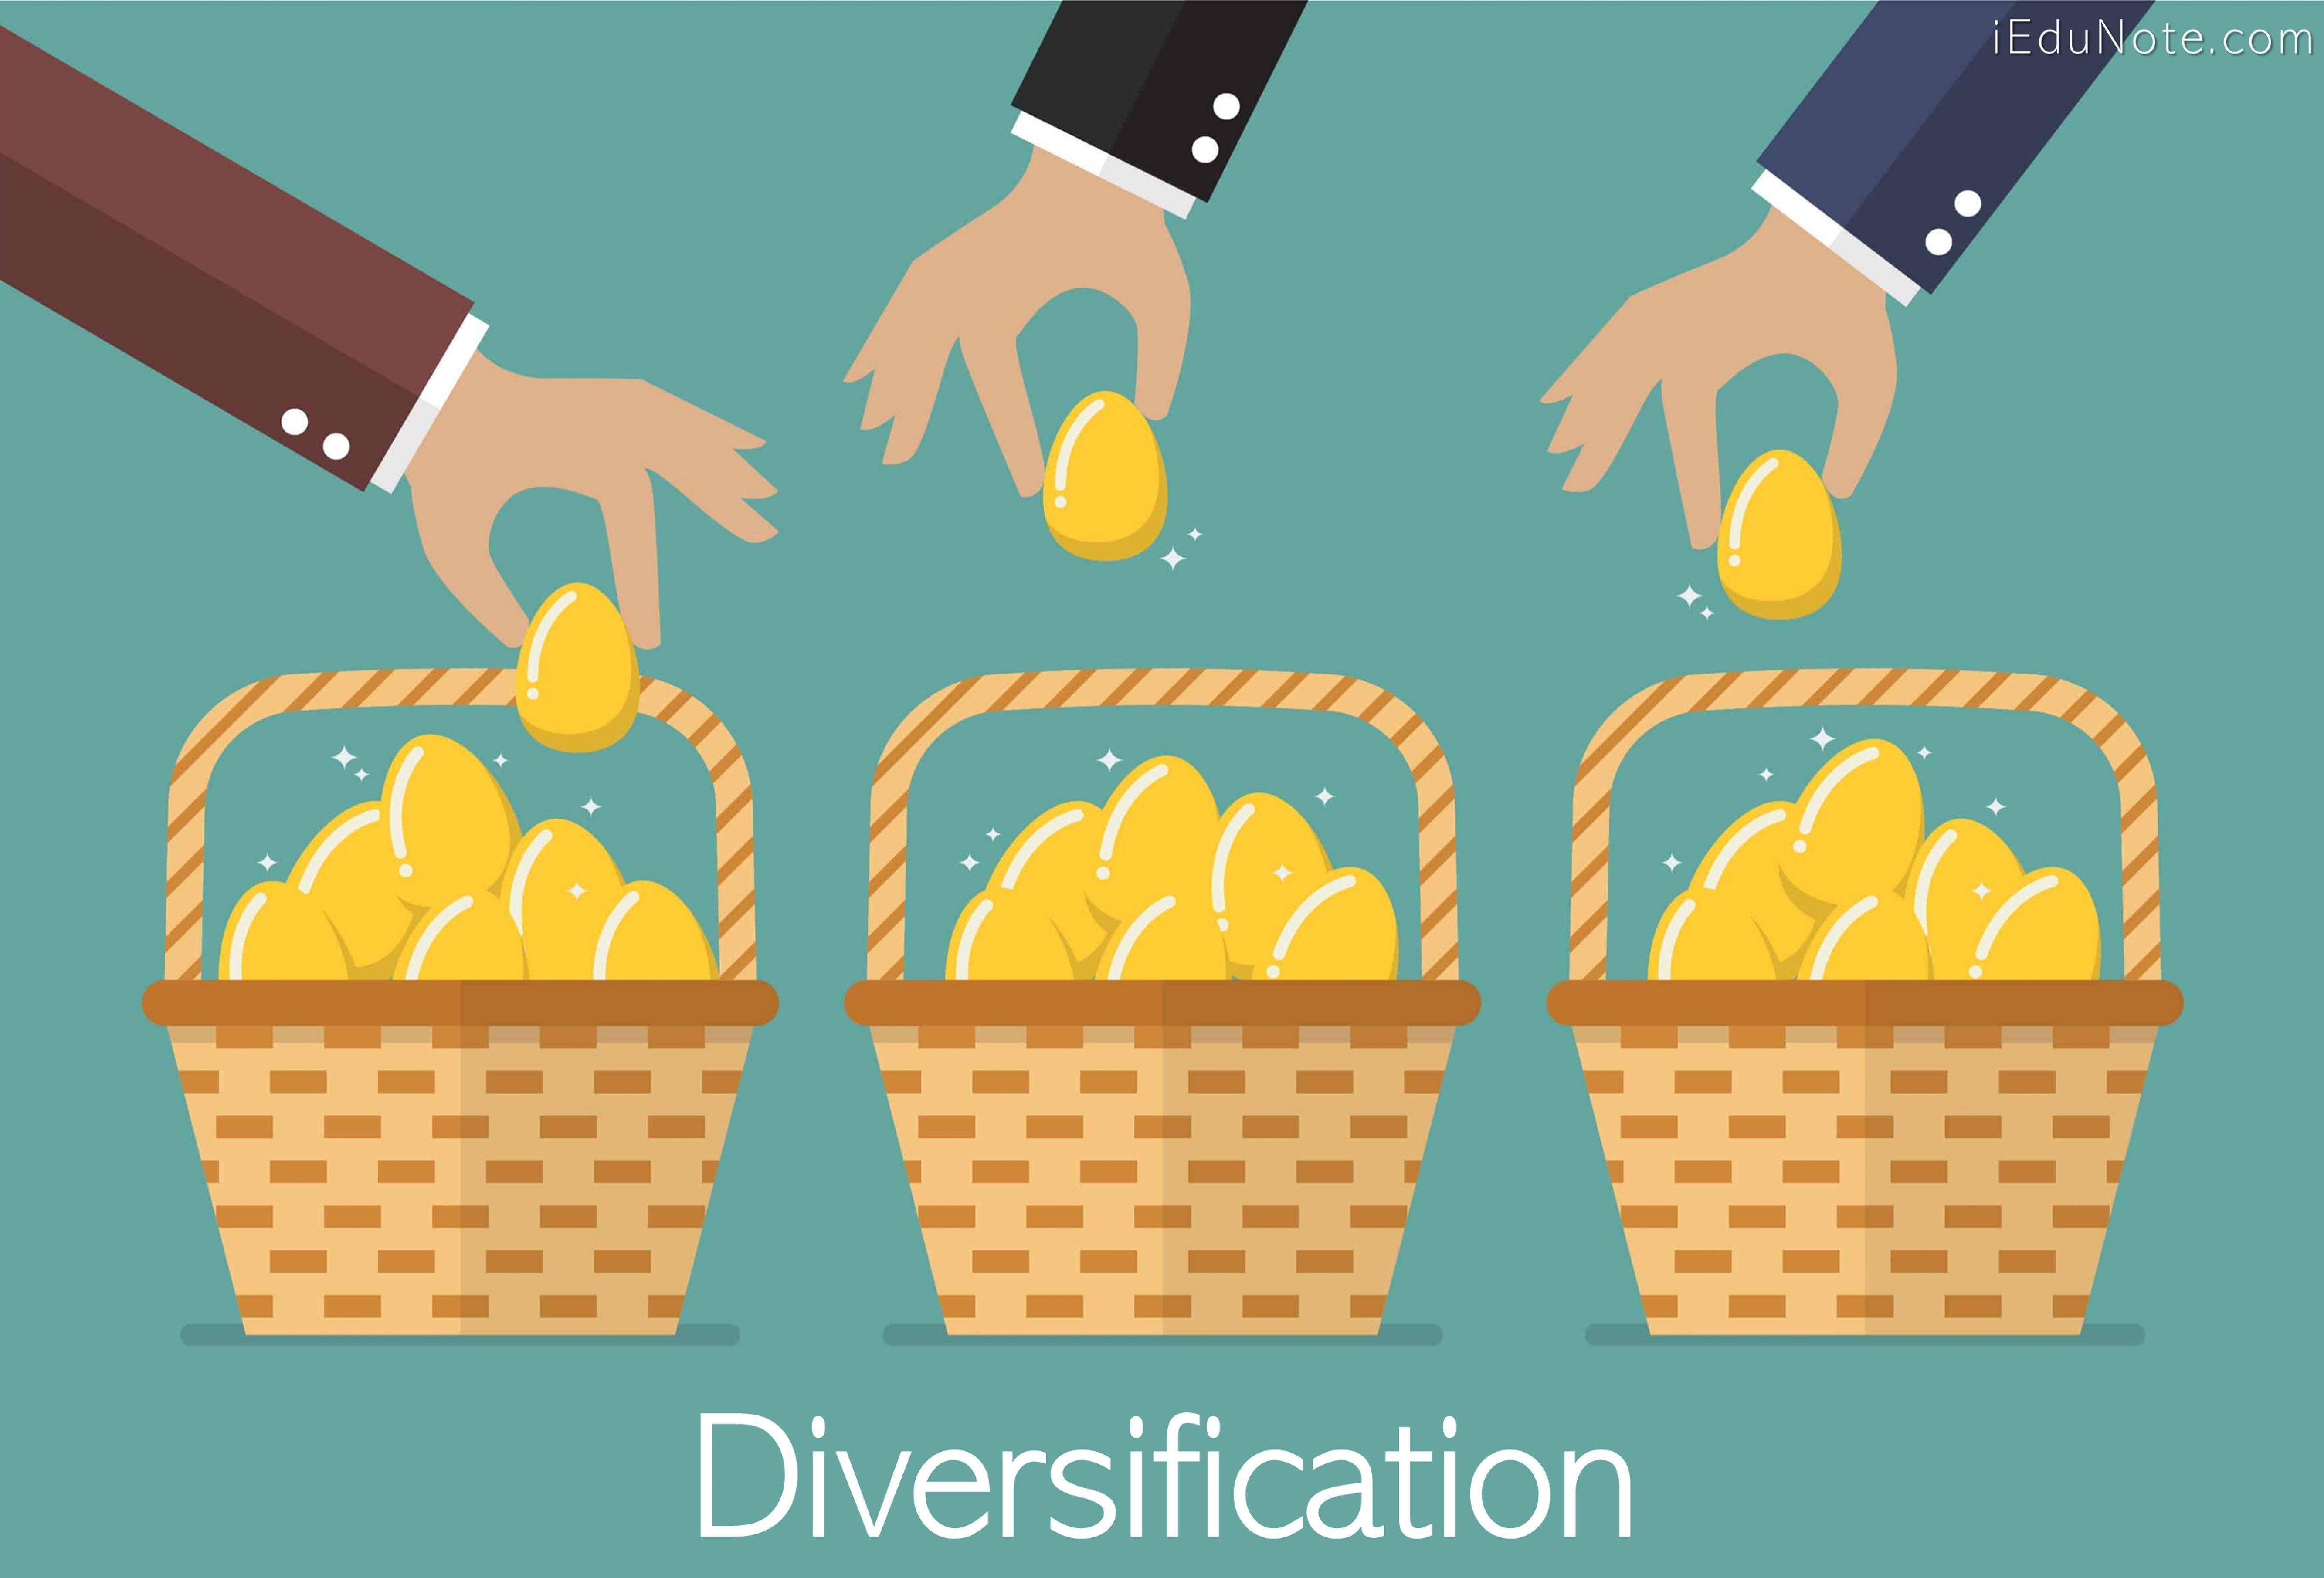 Diversification Definition, Levels, Strategy, Risks